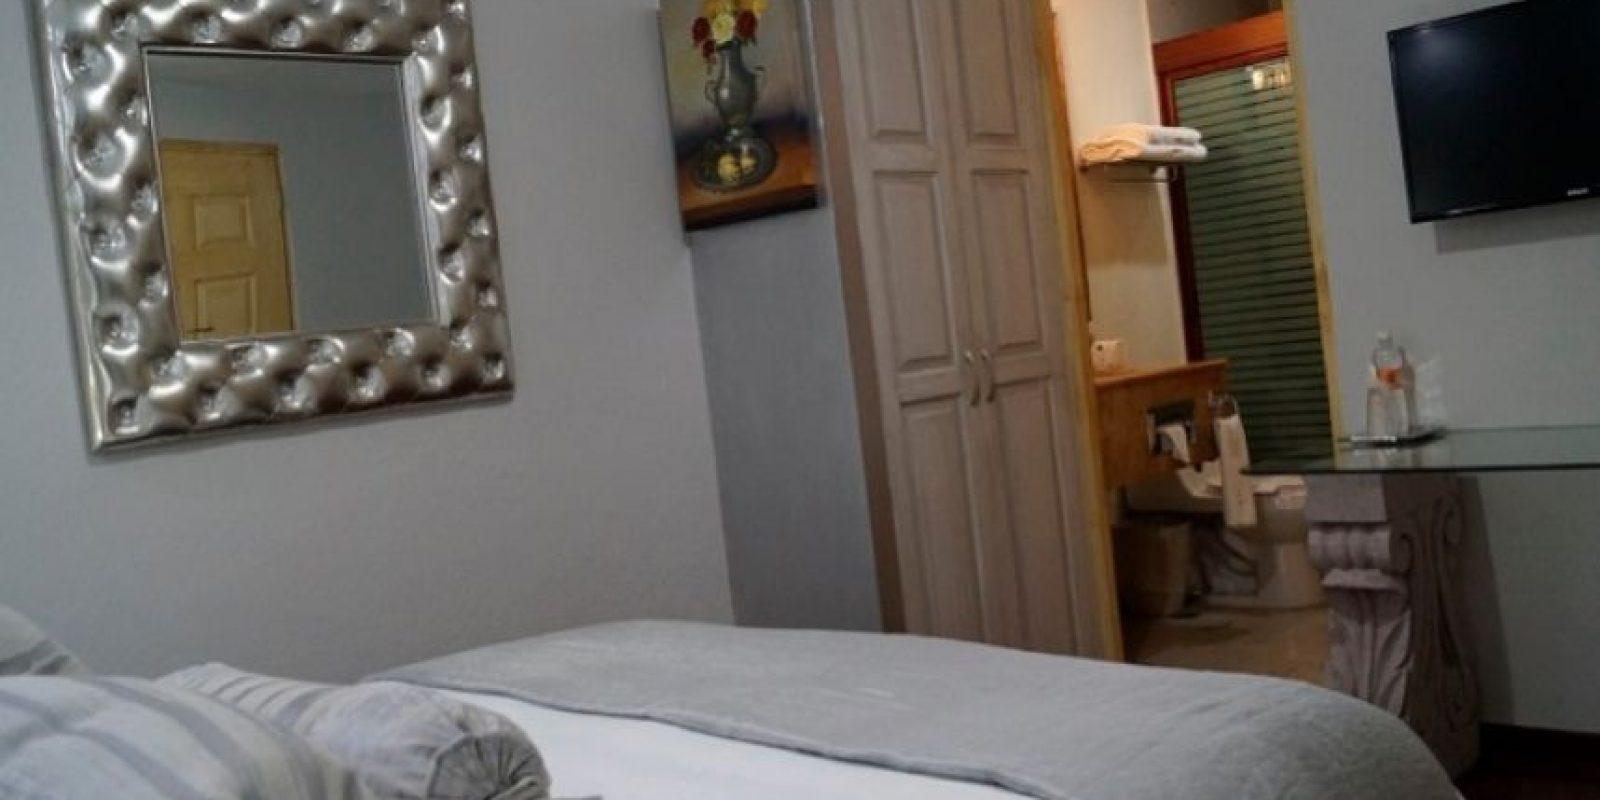 Plateado: 7 horas 33 minutos Foto:Hotelvillaherman.com